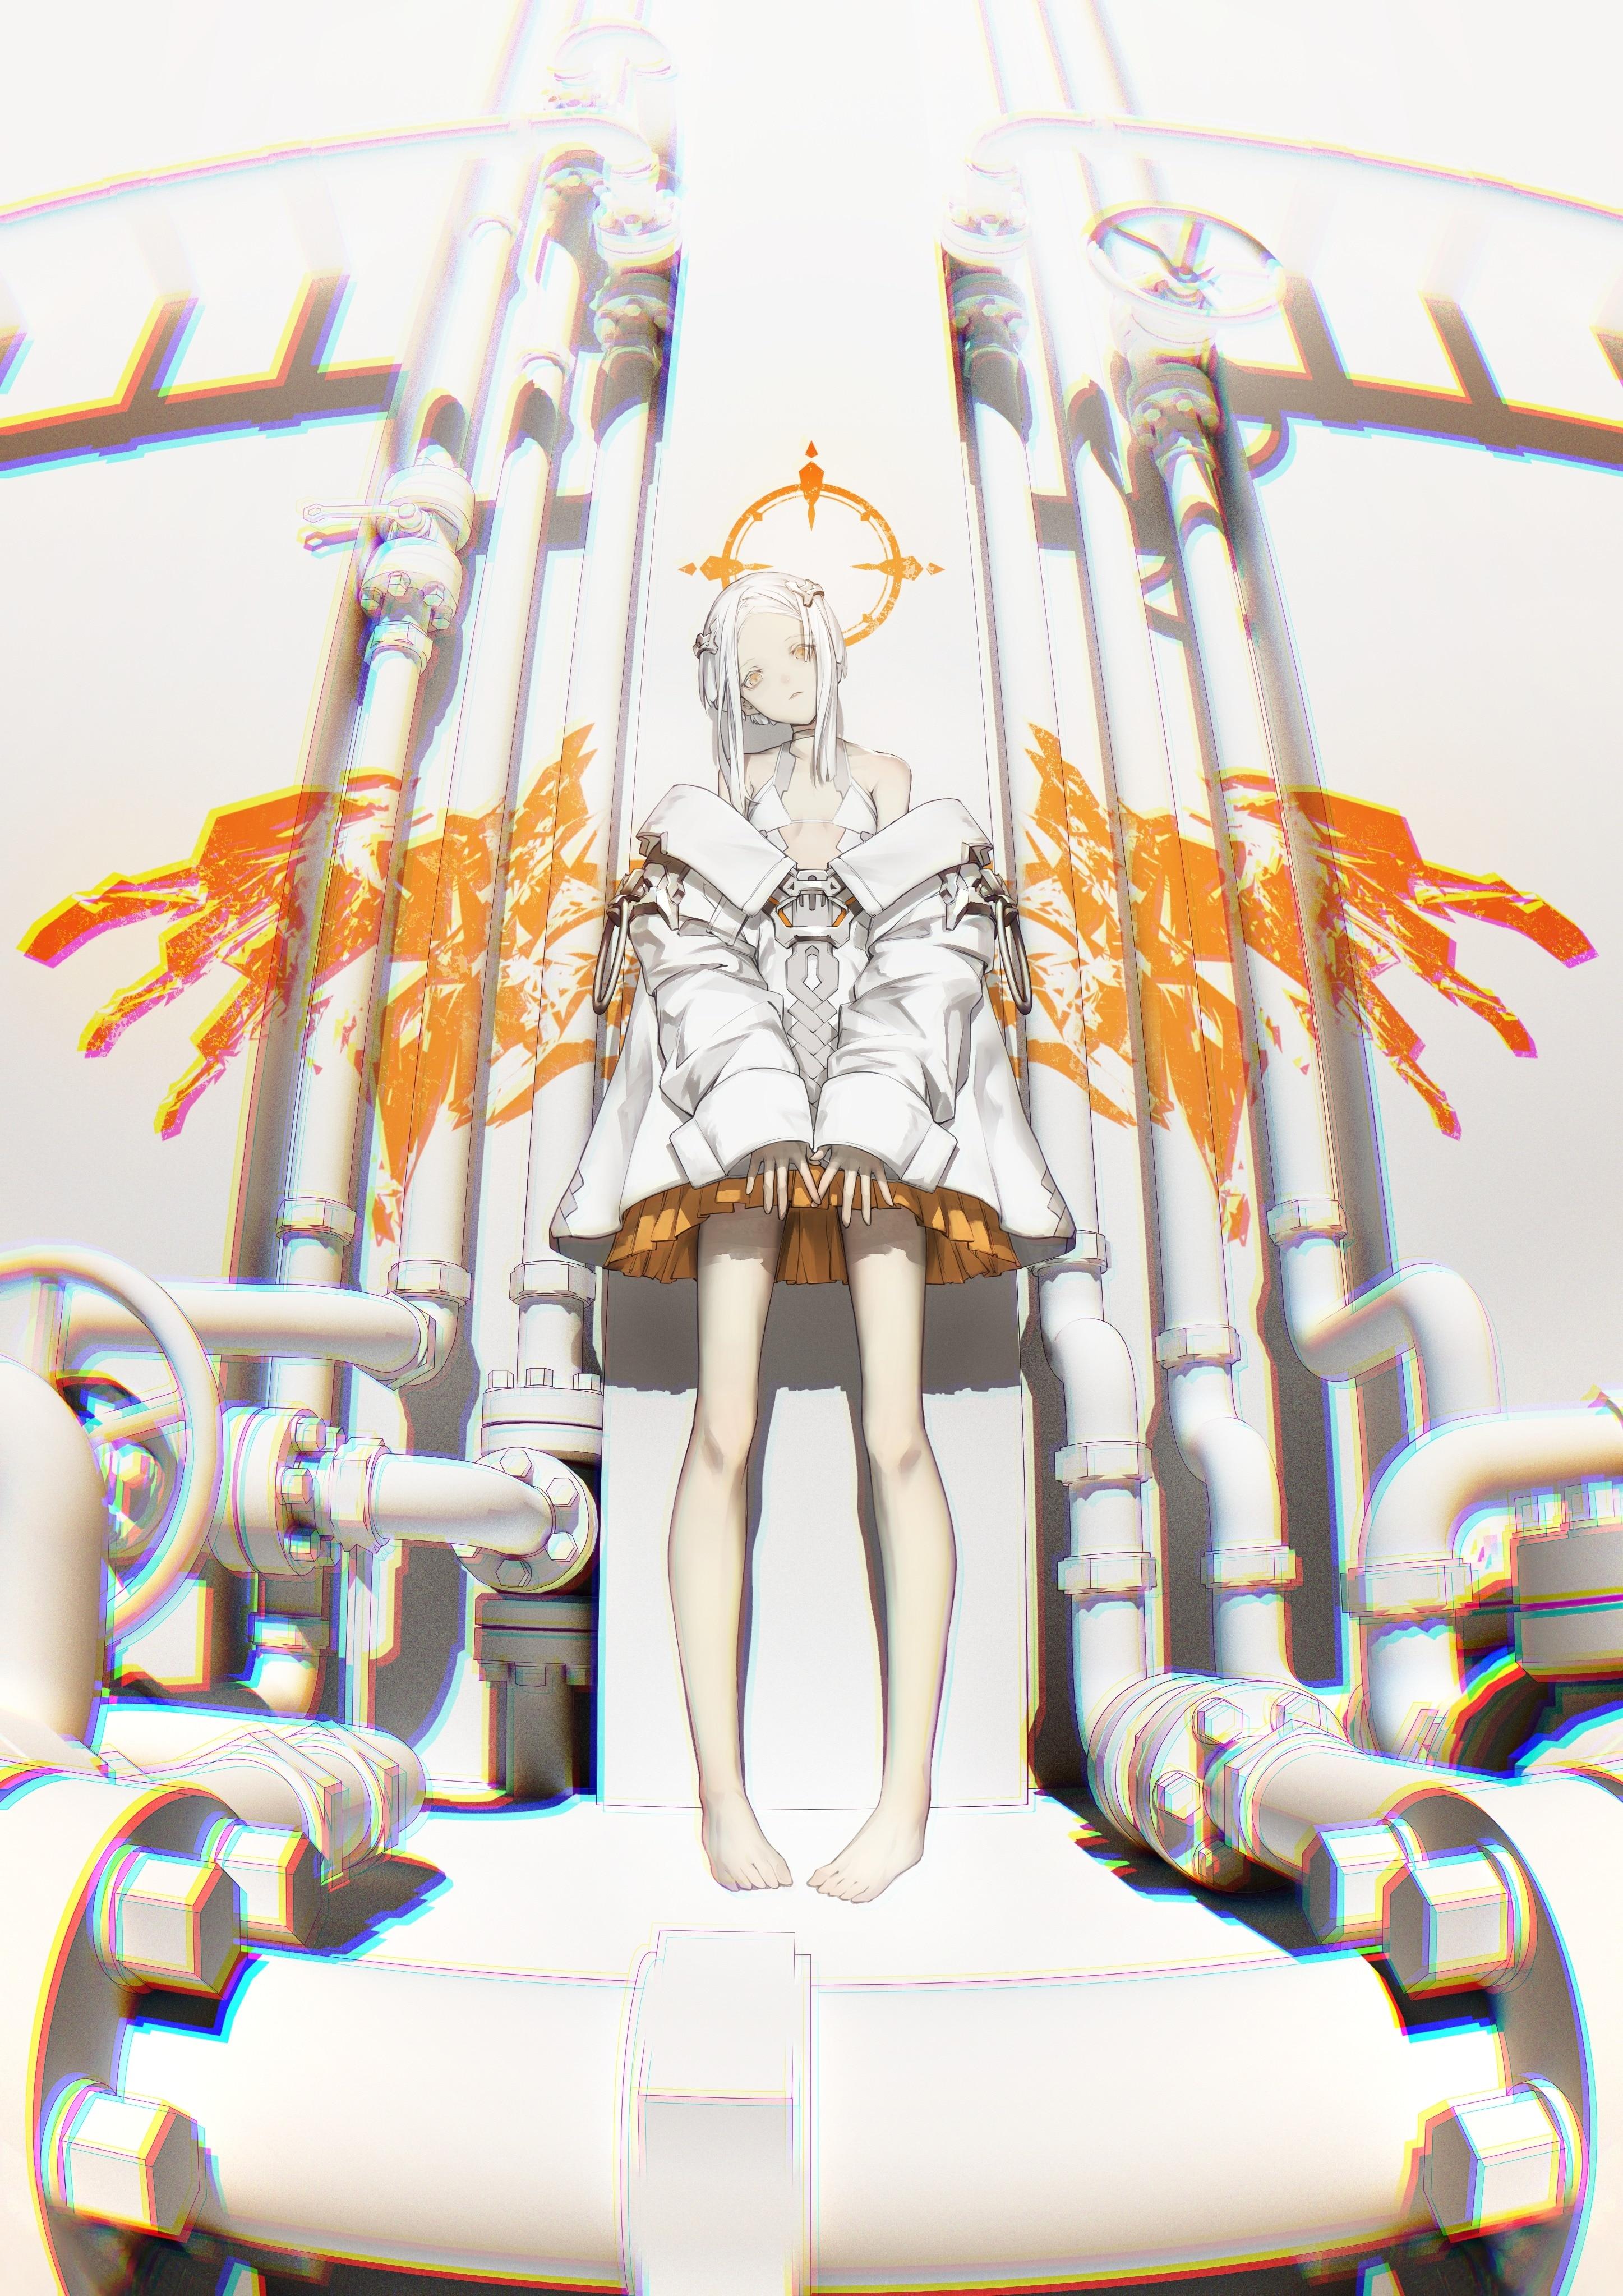 【P站画师】日本画师MIYA*KI的插画作品- ACG17.COM